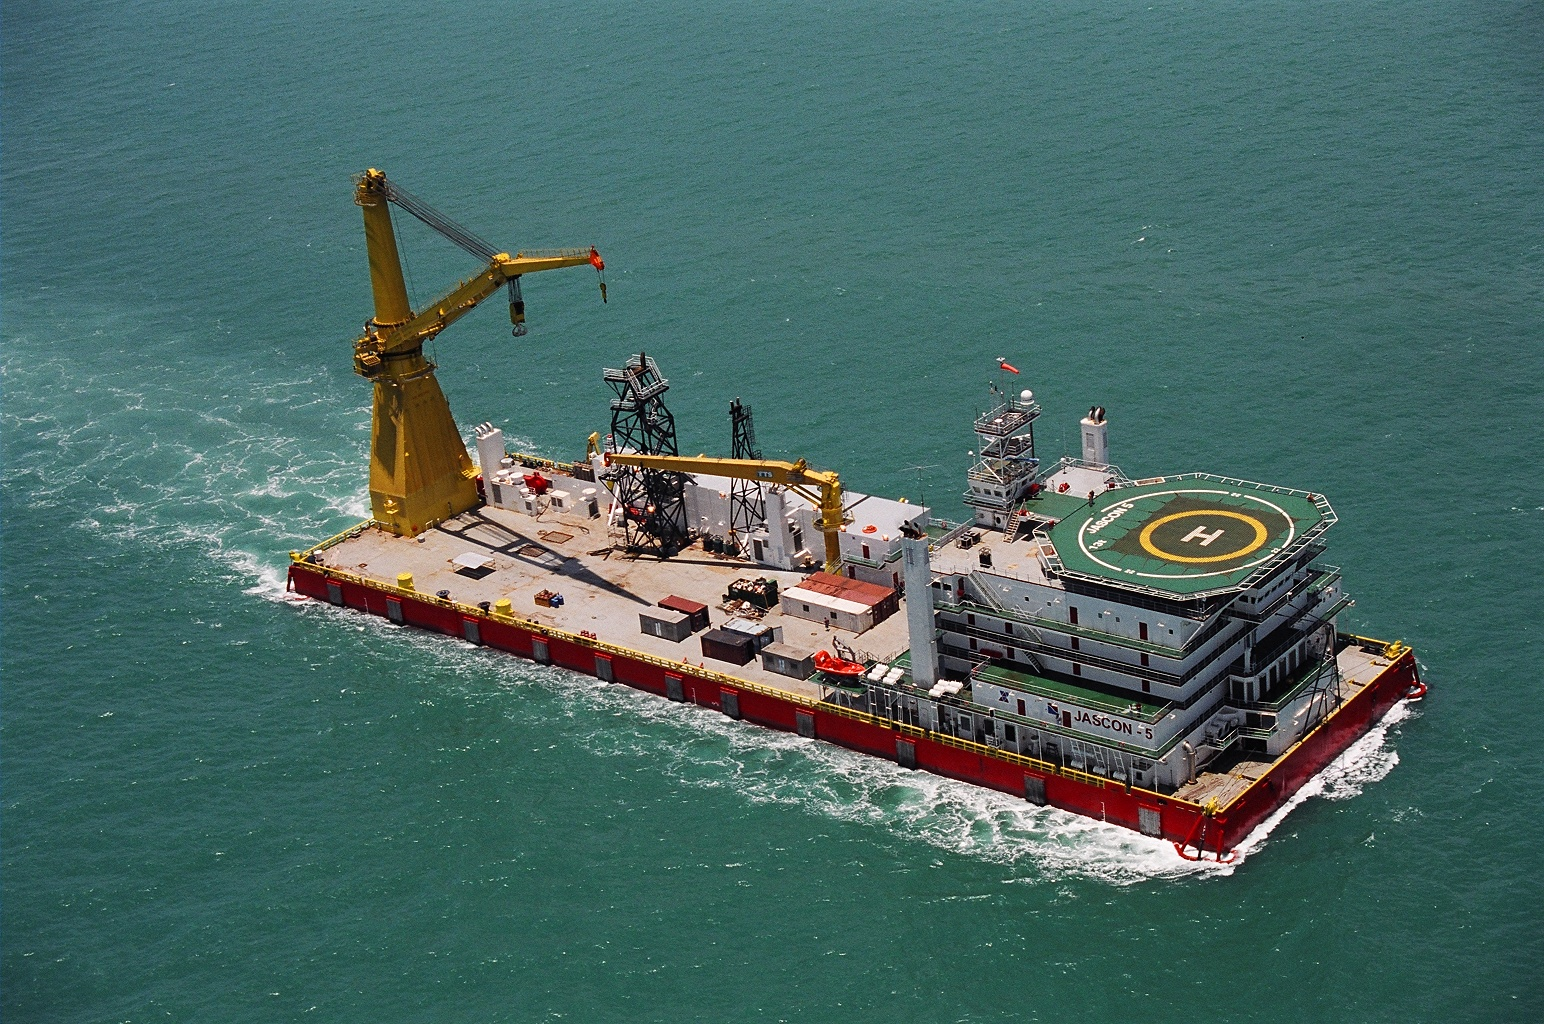 merchant marine engineer sample resume build garage plans small - Marine Service Engineer Sample Resume